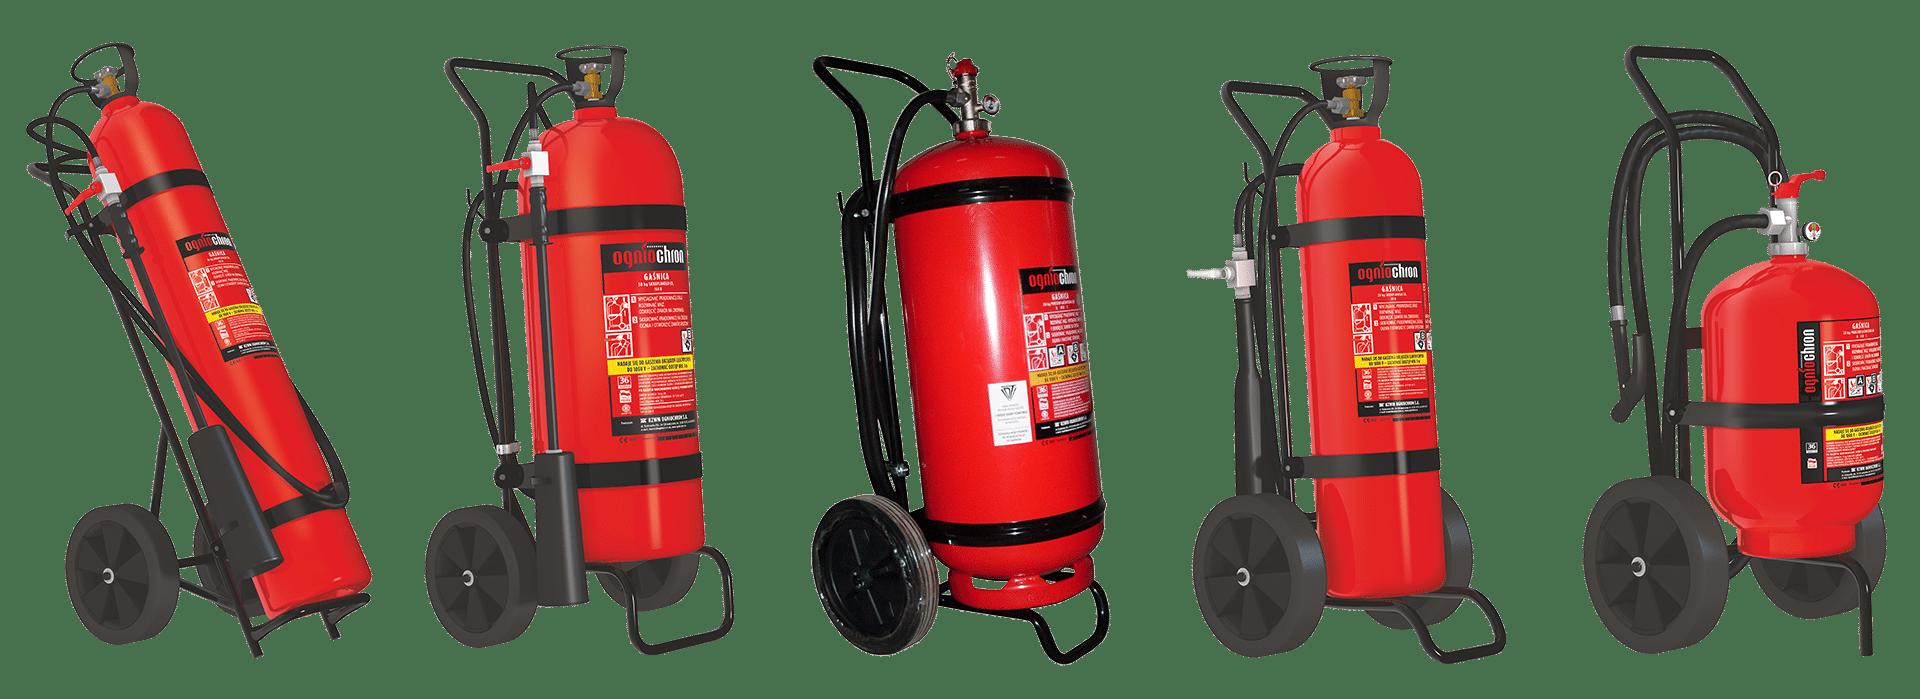 verrijdbare brandblussers 20kg 50kg